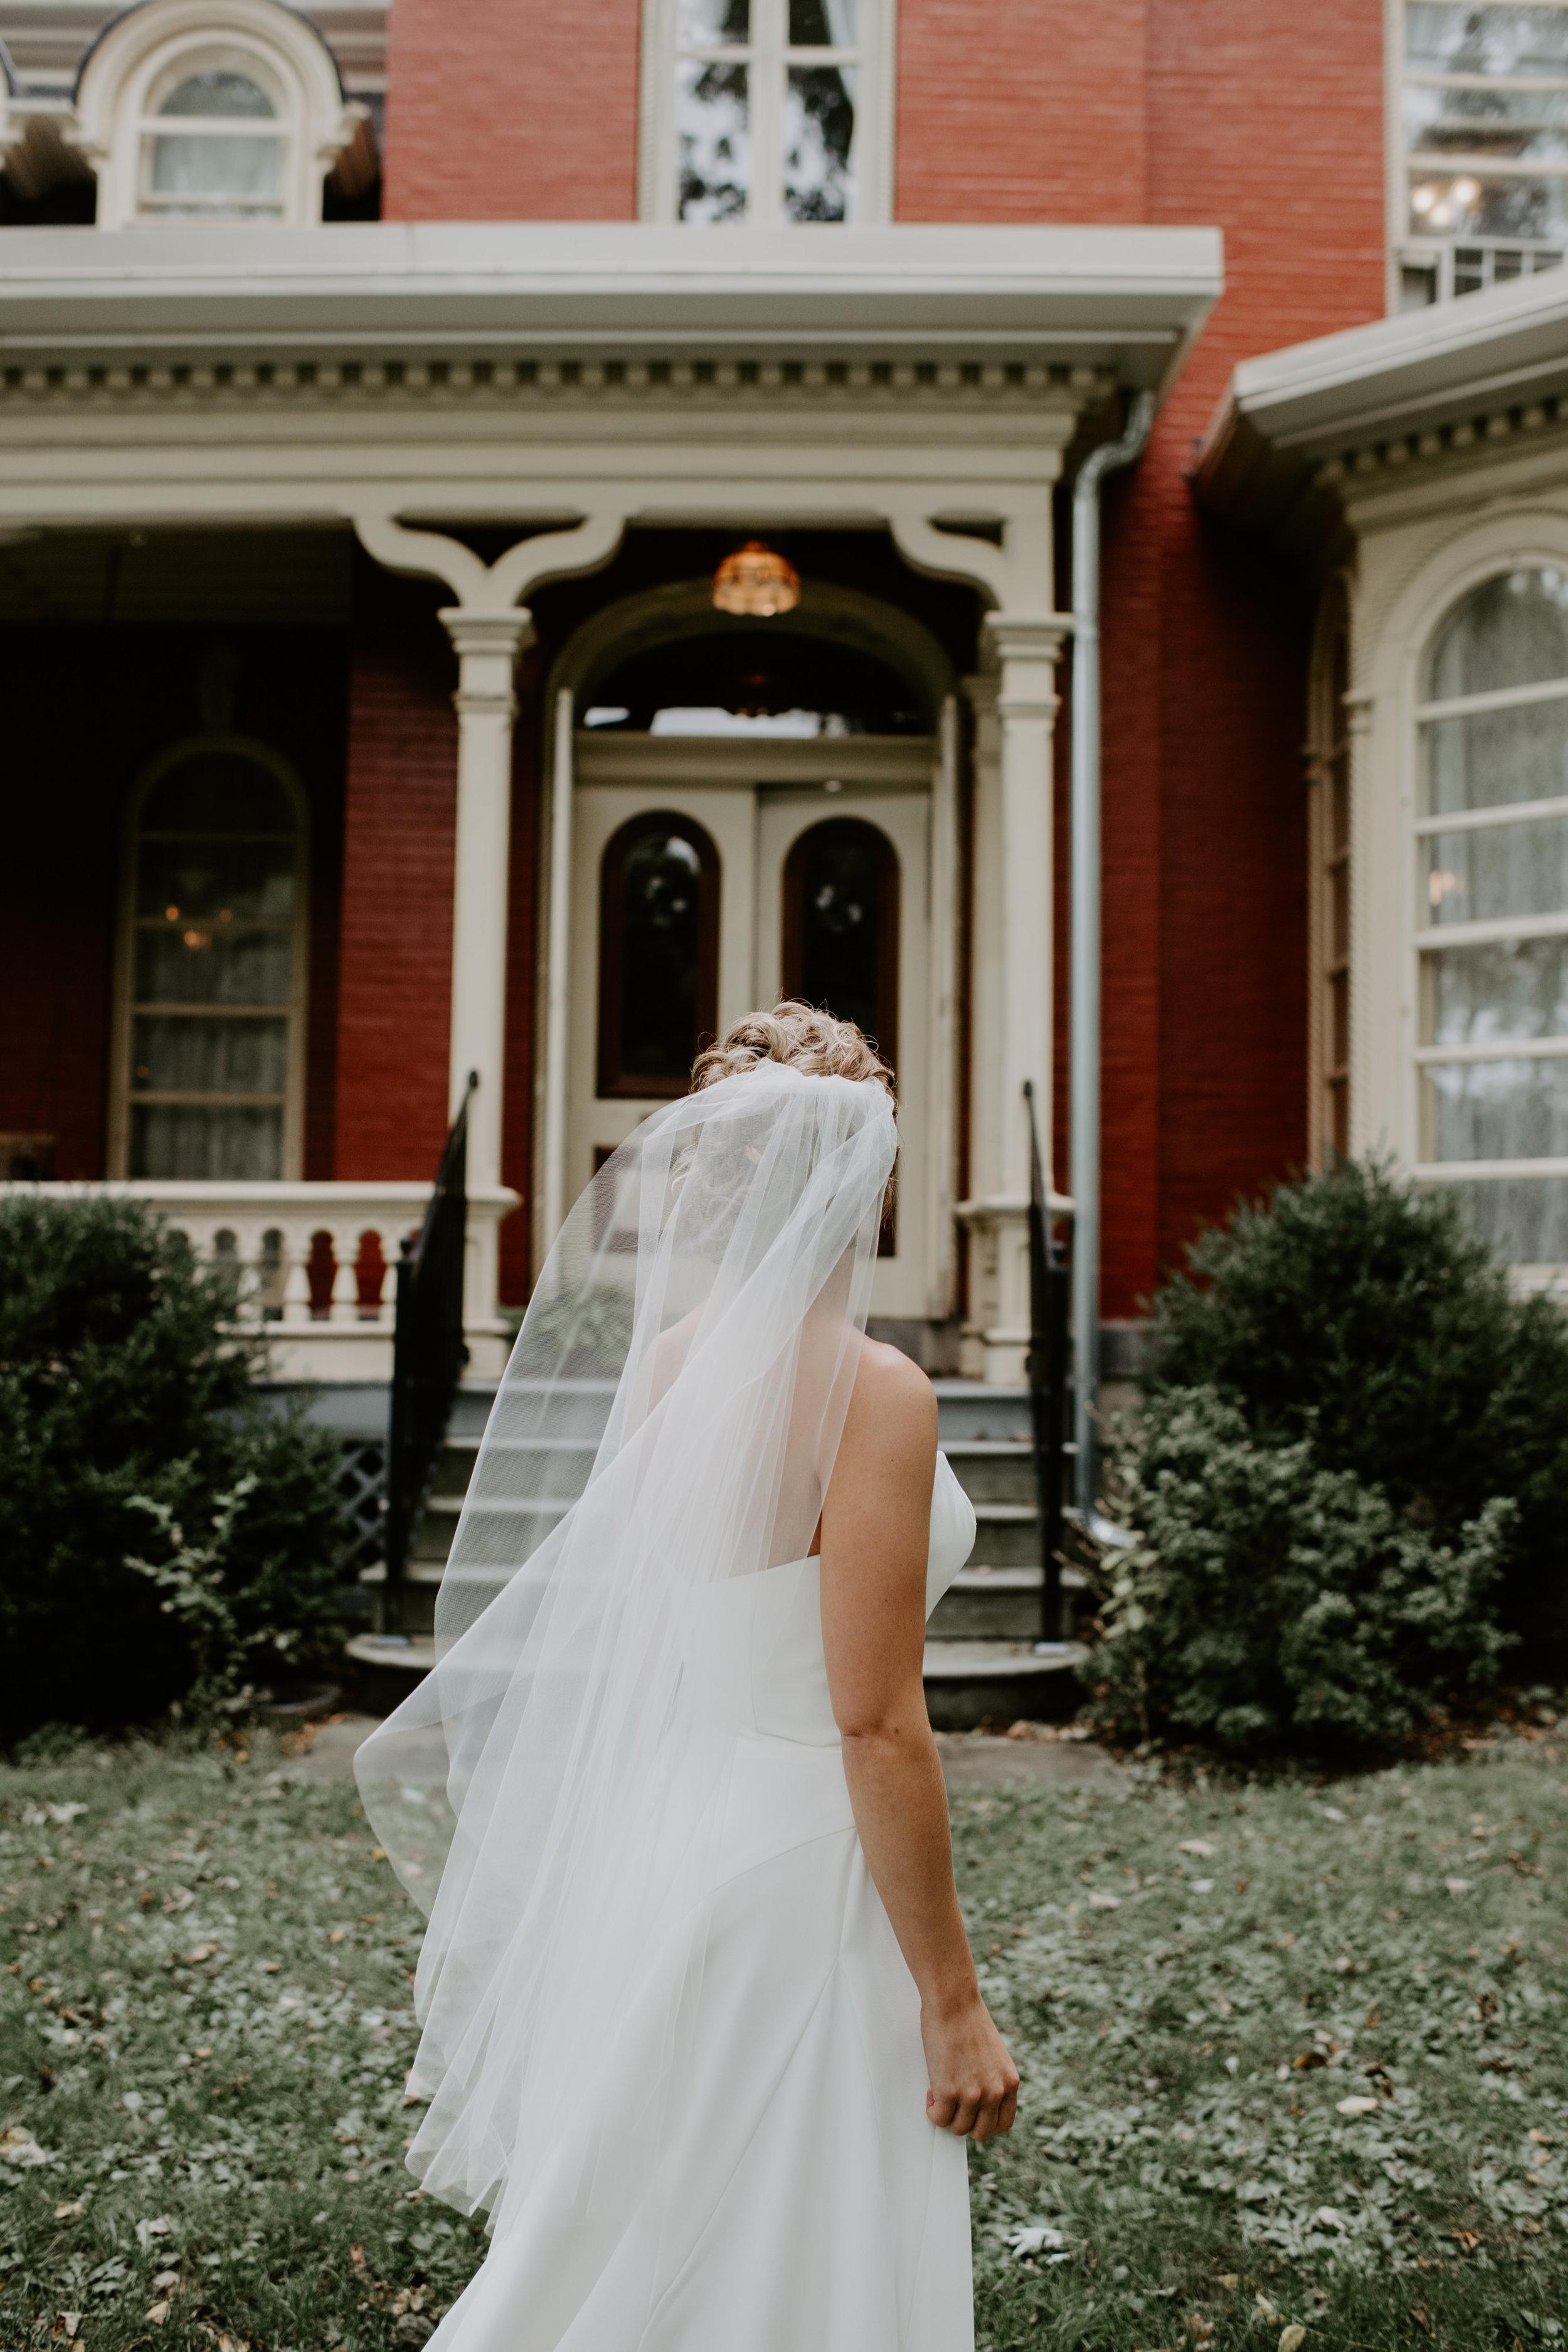 APD_chris_justin_wedding-226 copy.jpg